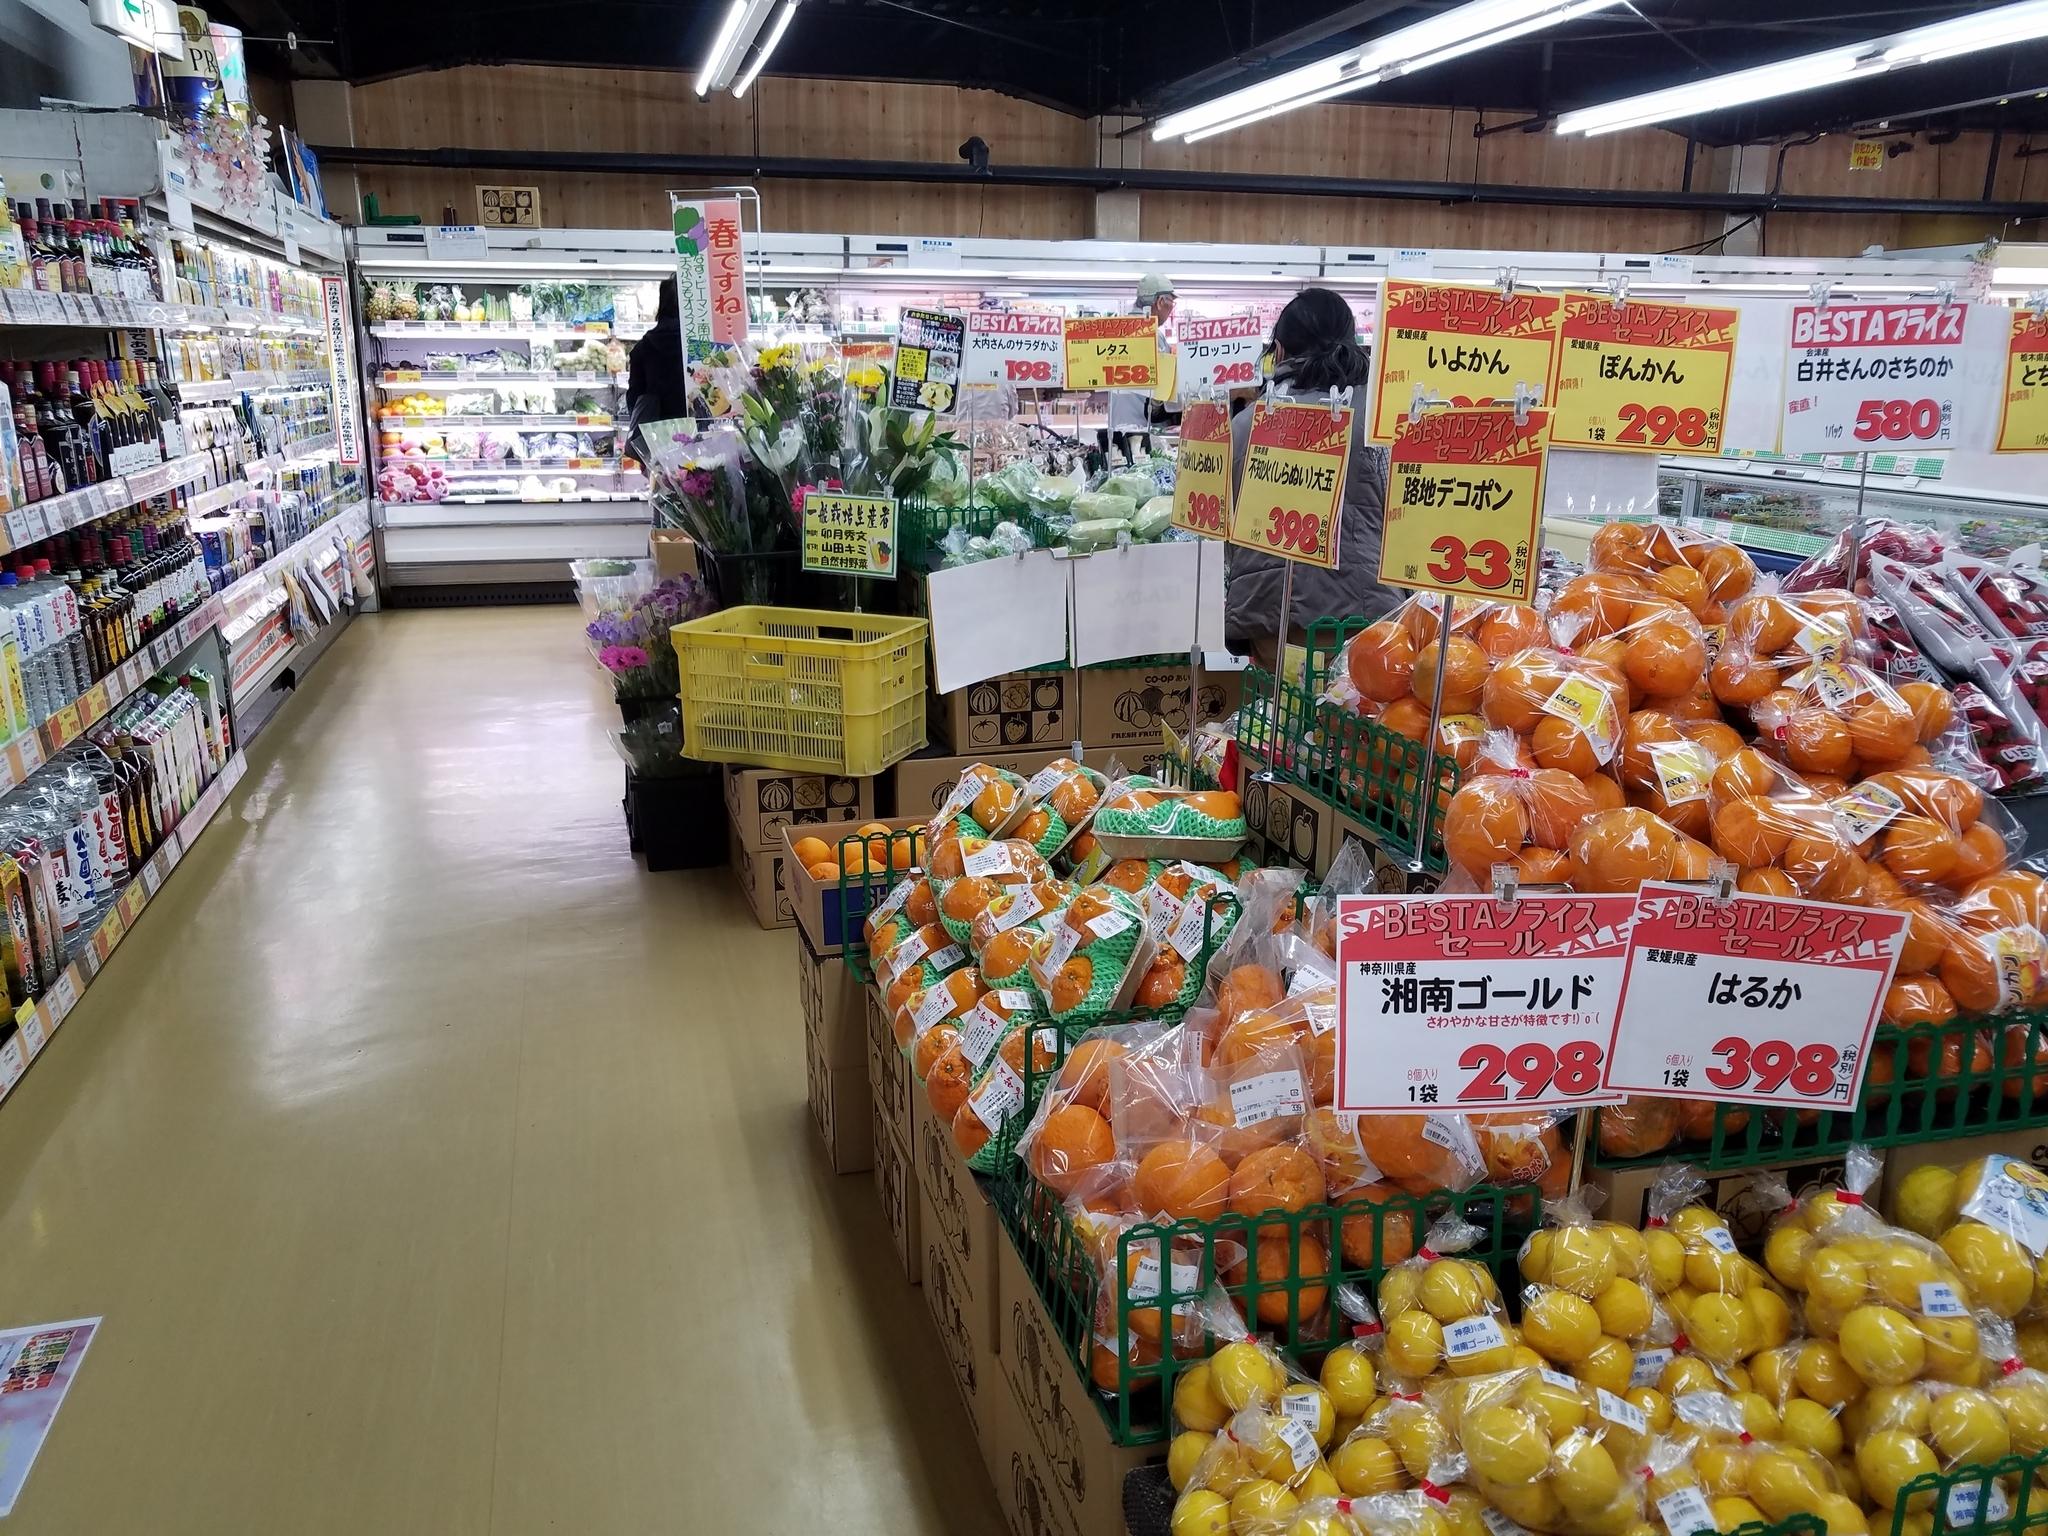 f:id:ToshUeno:20180330144841j:plain